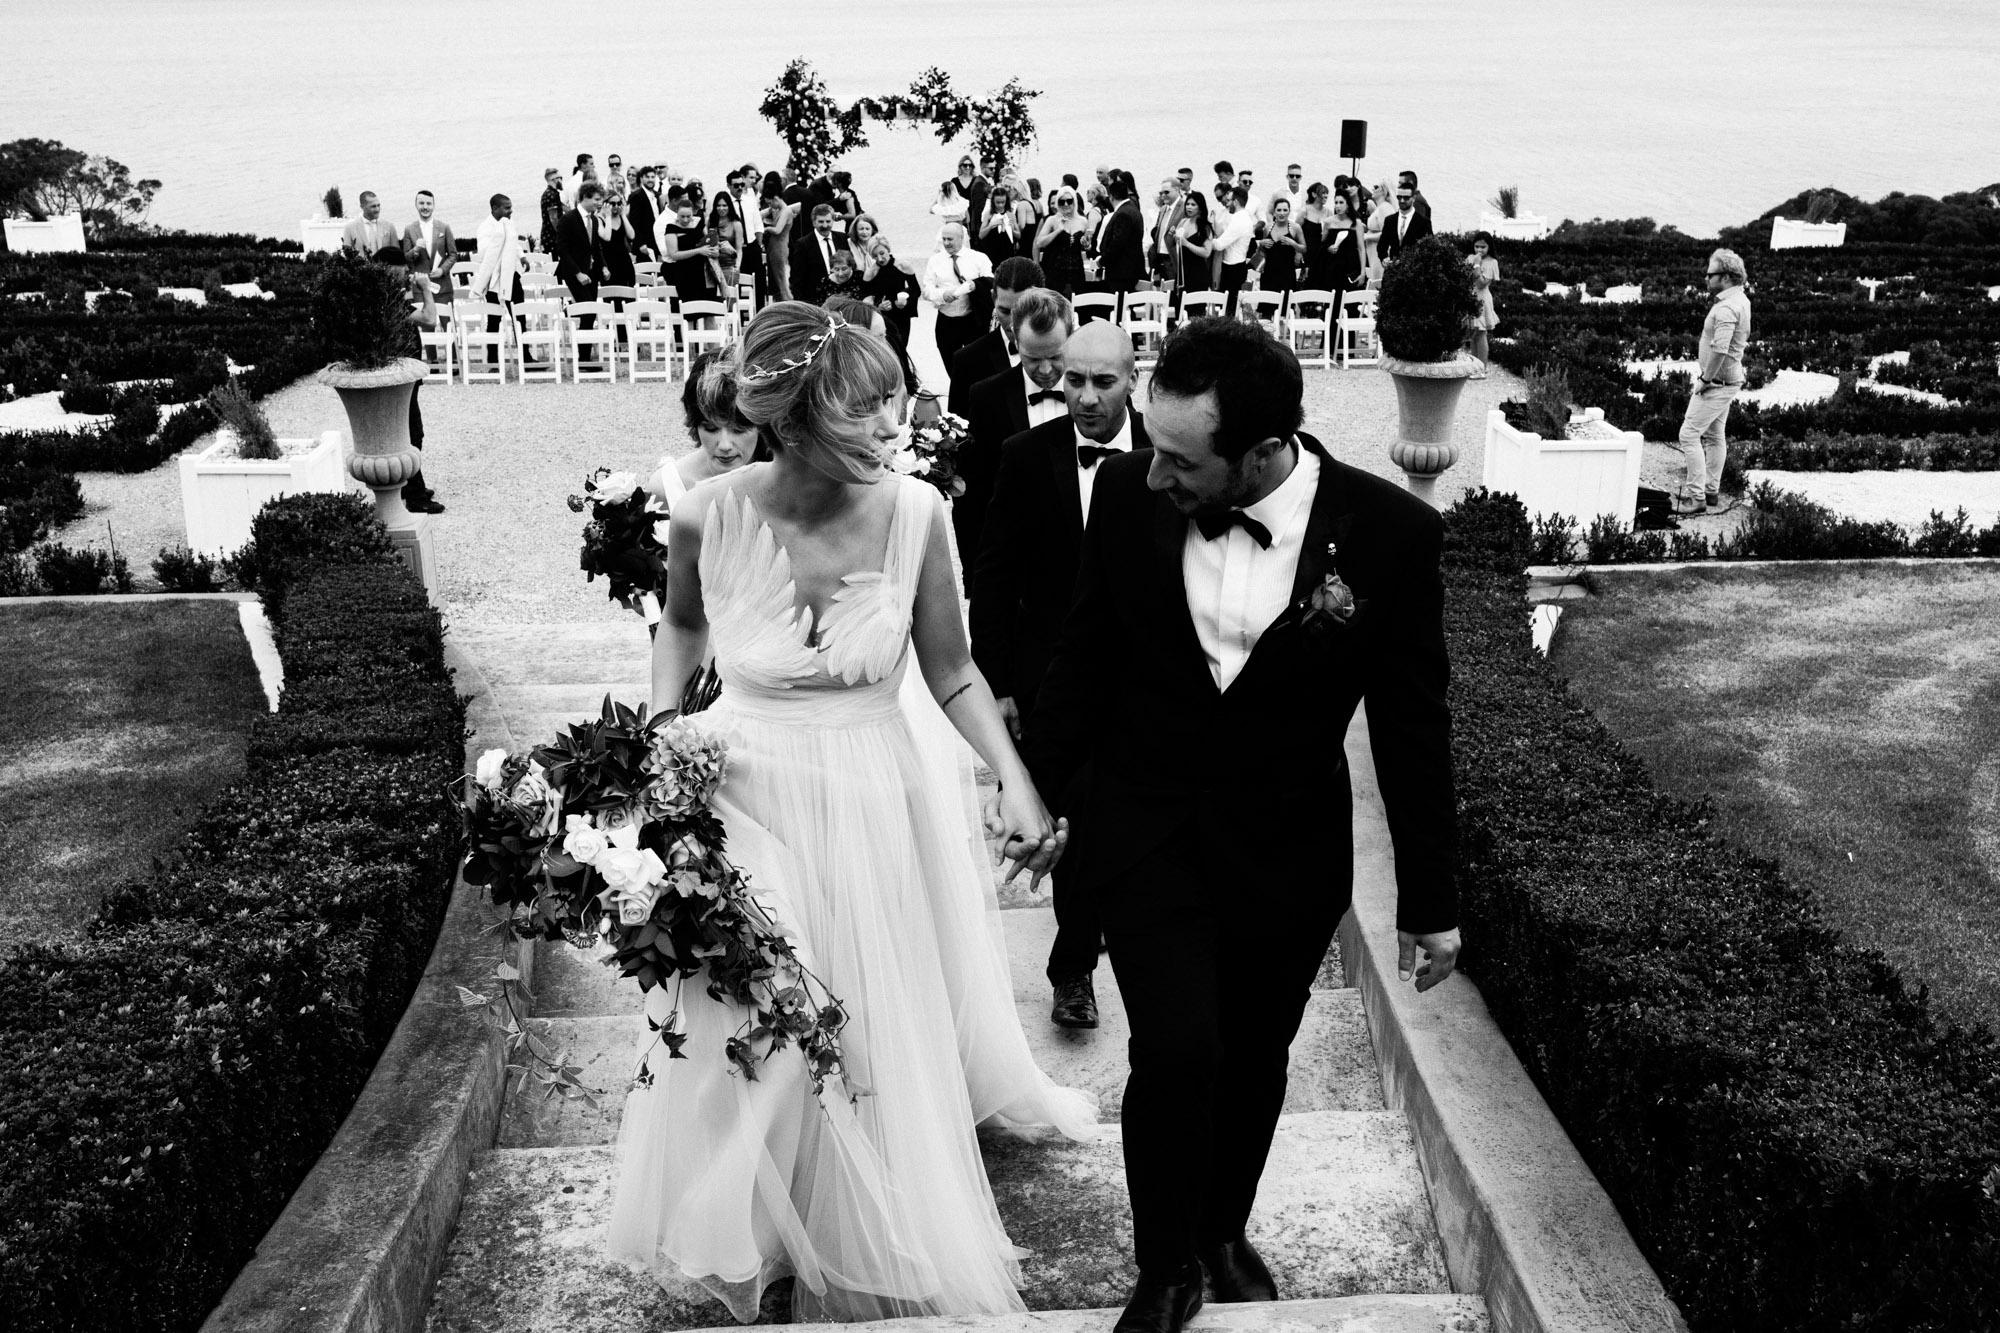 Campbell Point House Wedding HJ + Dean Raphael Weddings-84.jpg